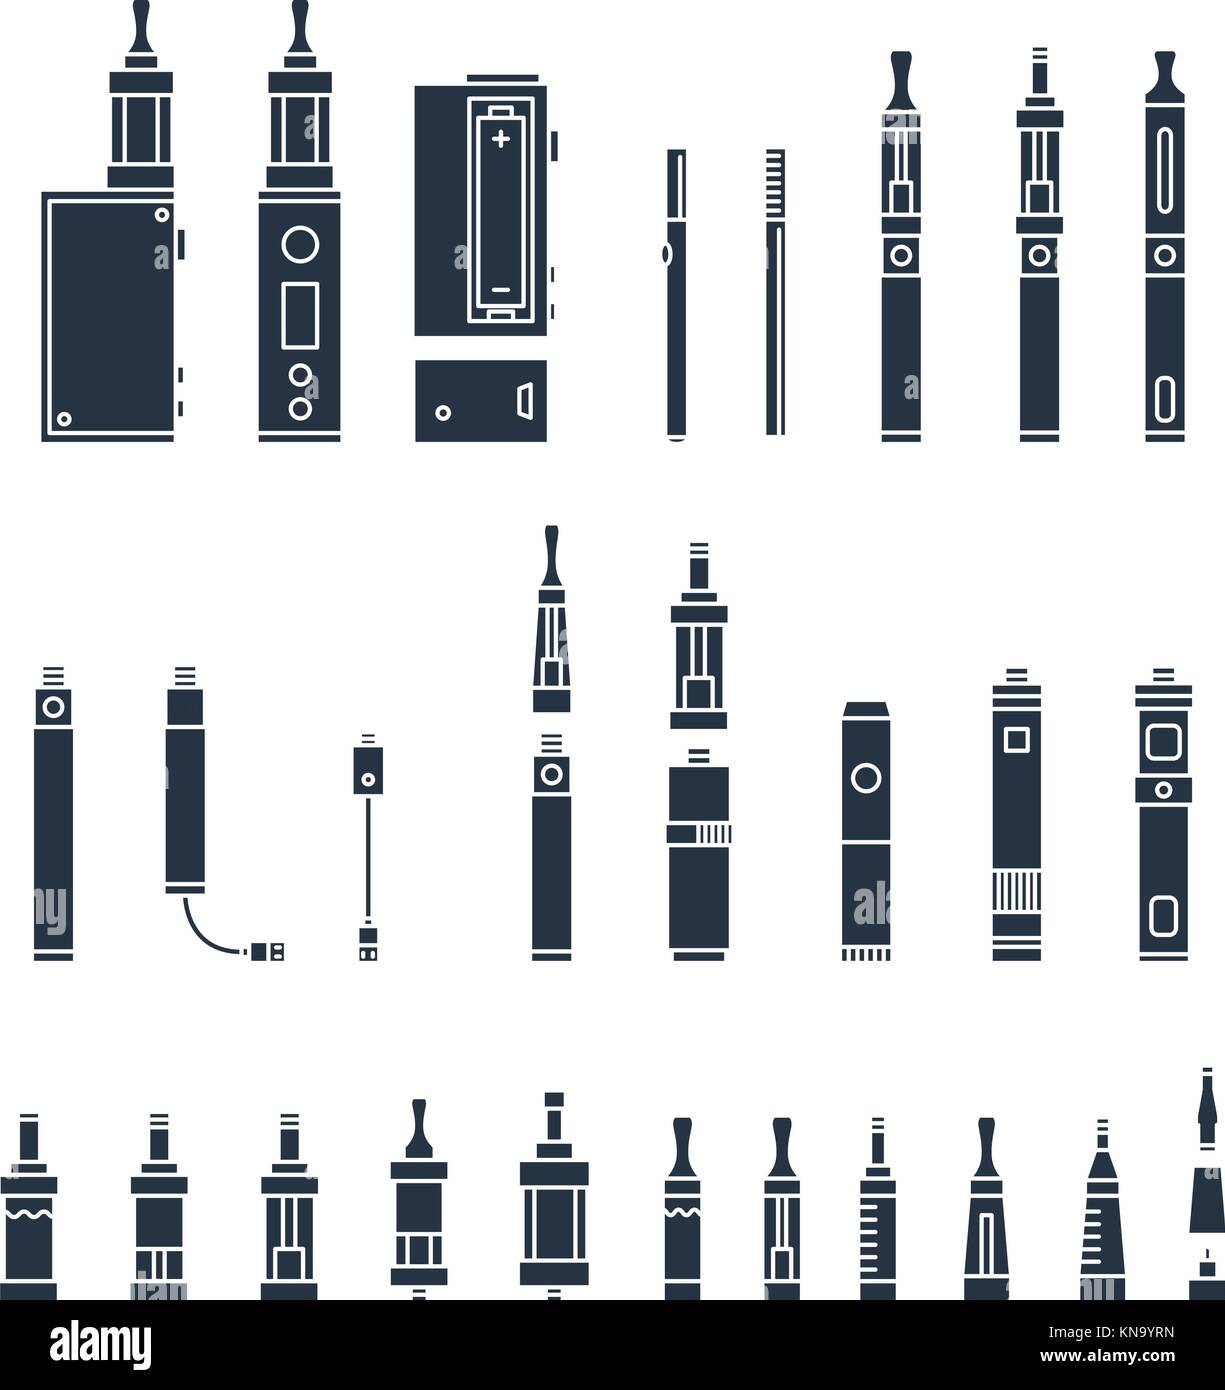 vecor set of vape related simple Icons. RDA, Atomizer, drip tip, mod, e-liquid, coil - Stock Image